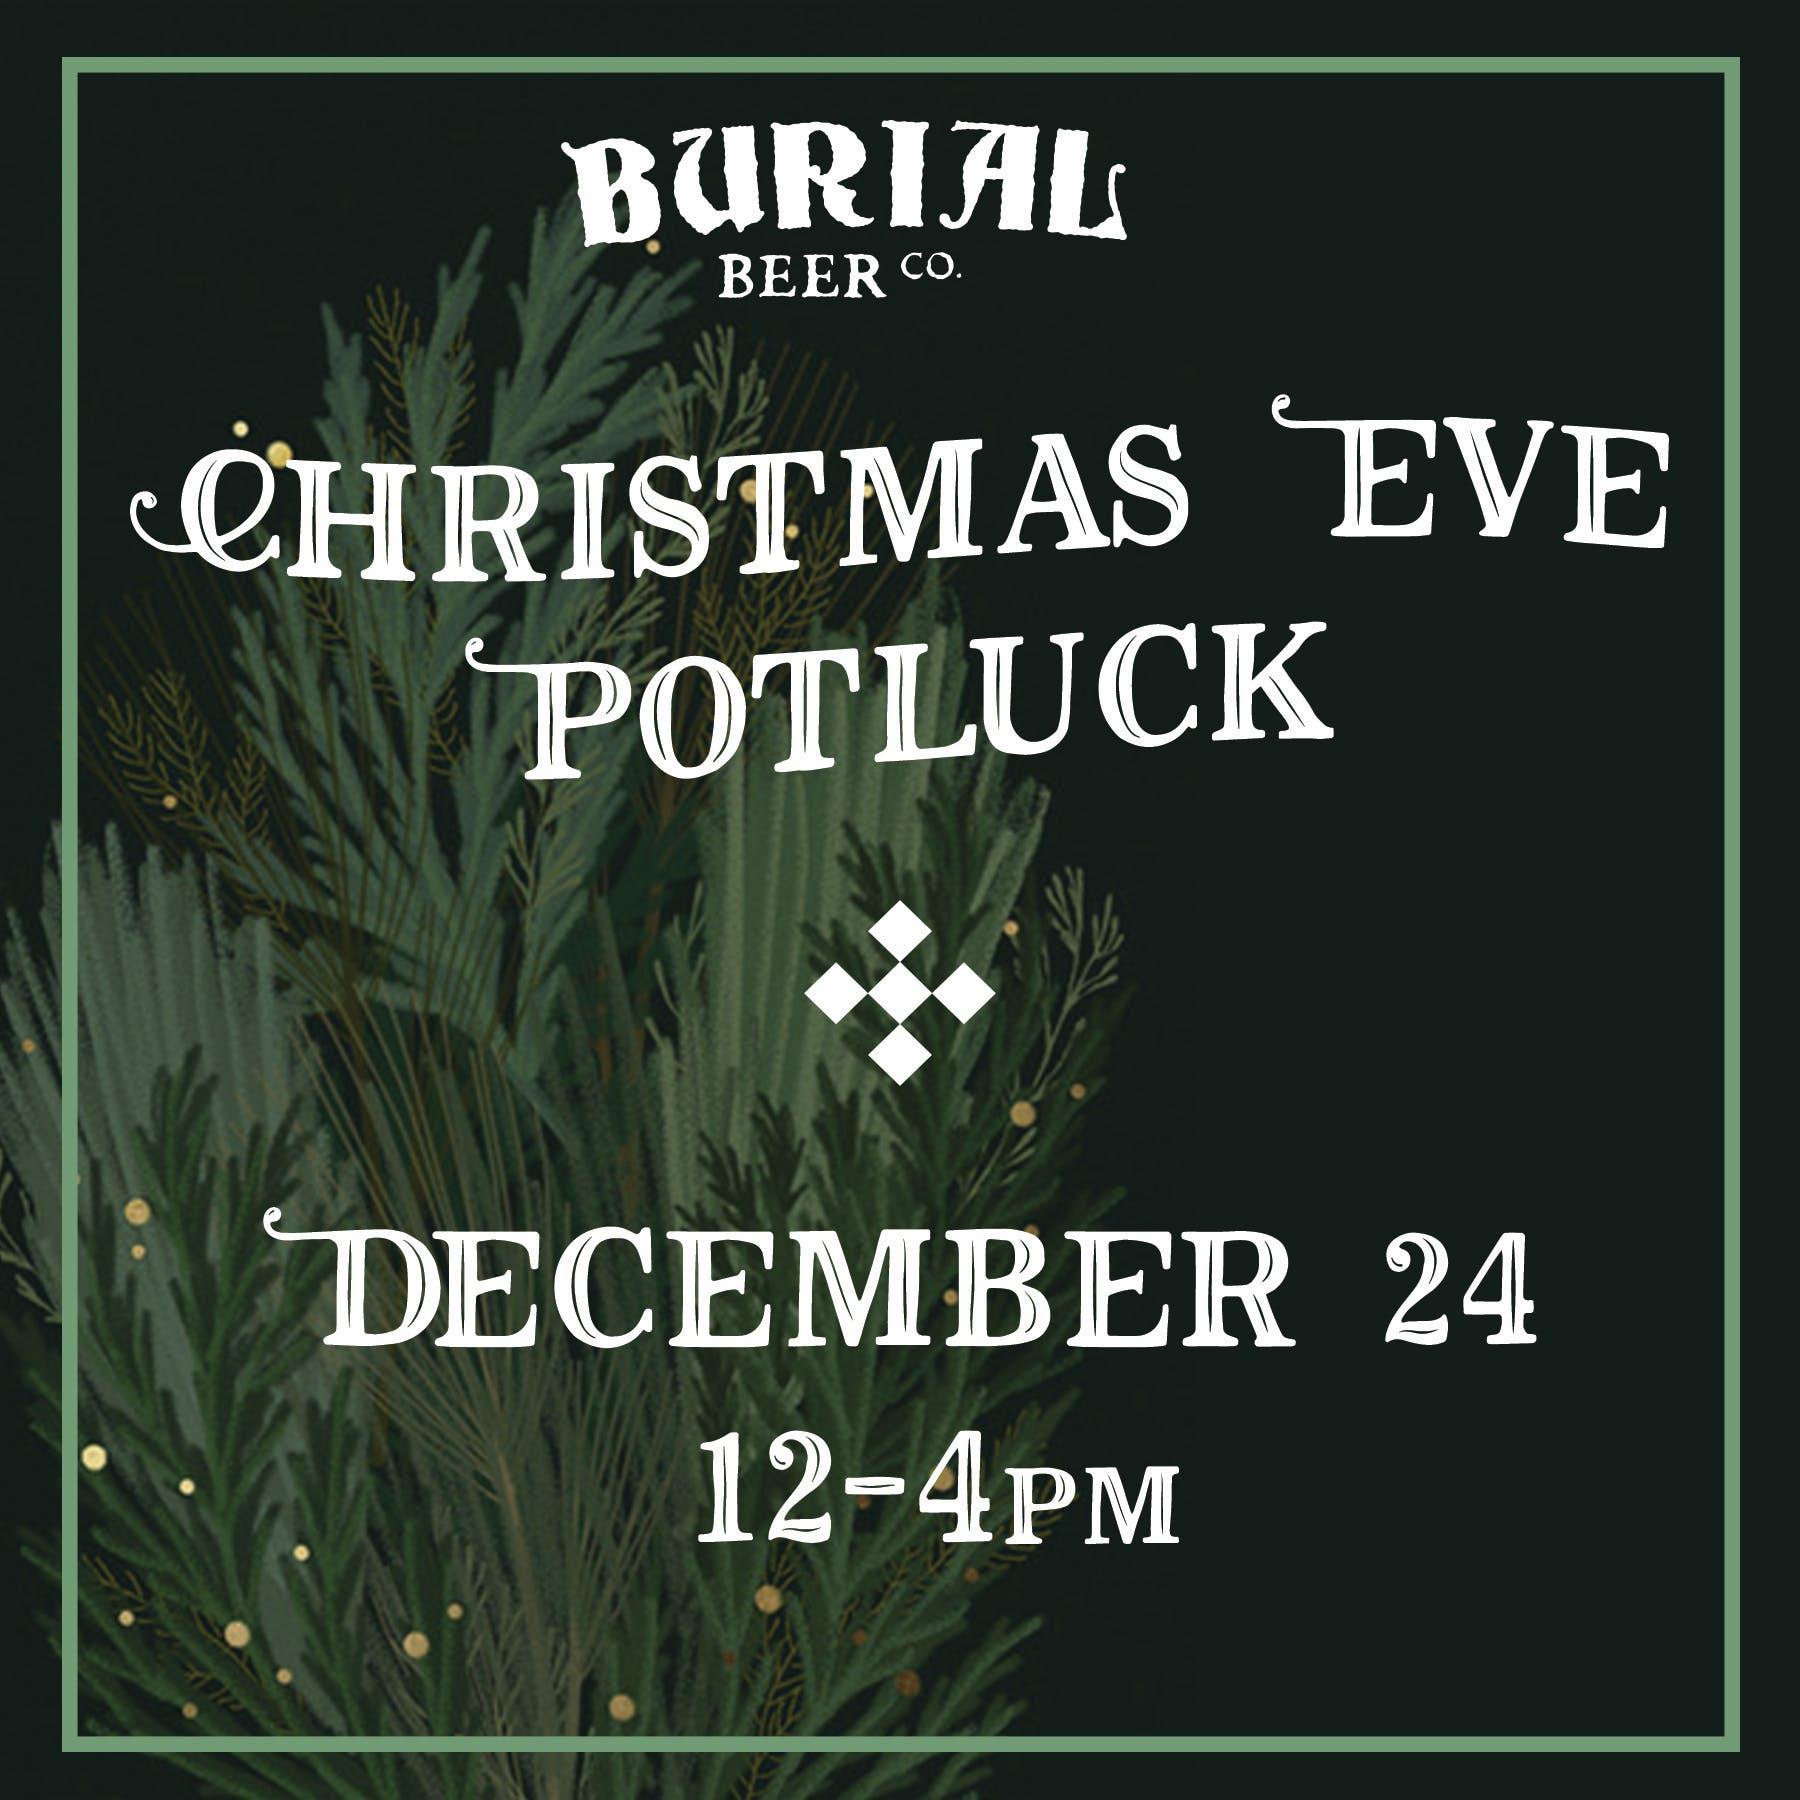 Burial Xmas Eve Potluck